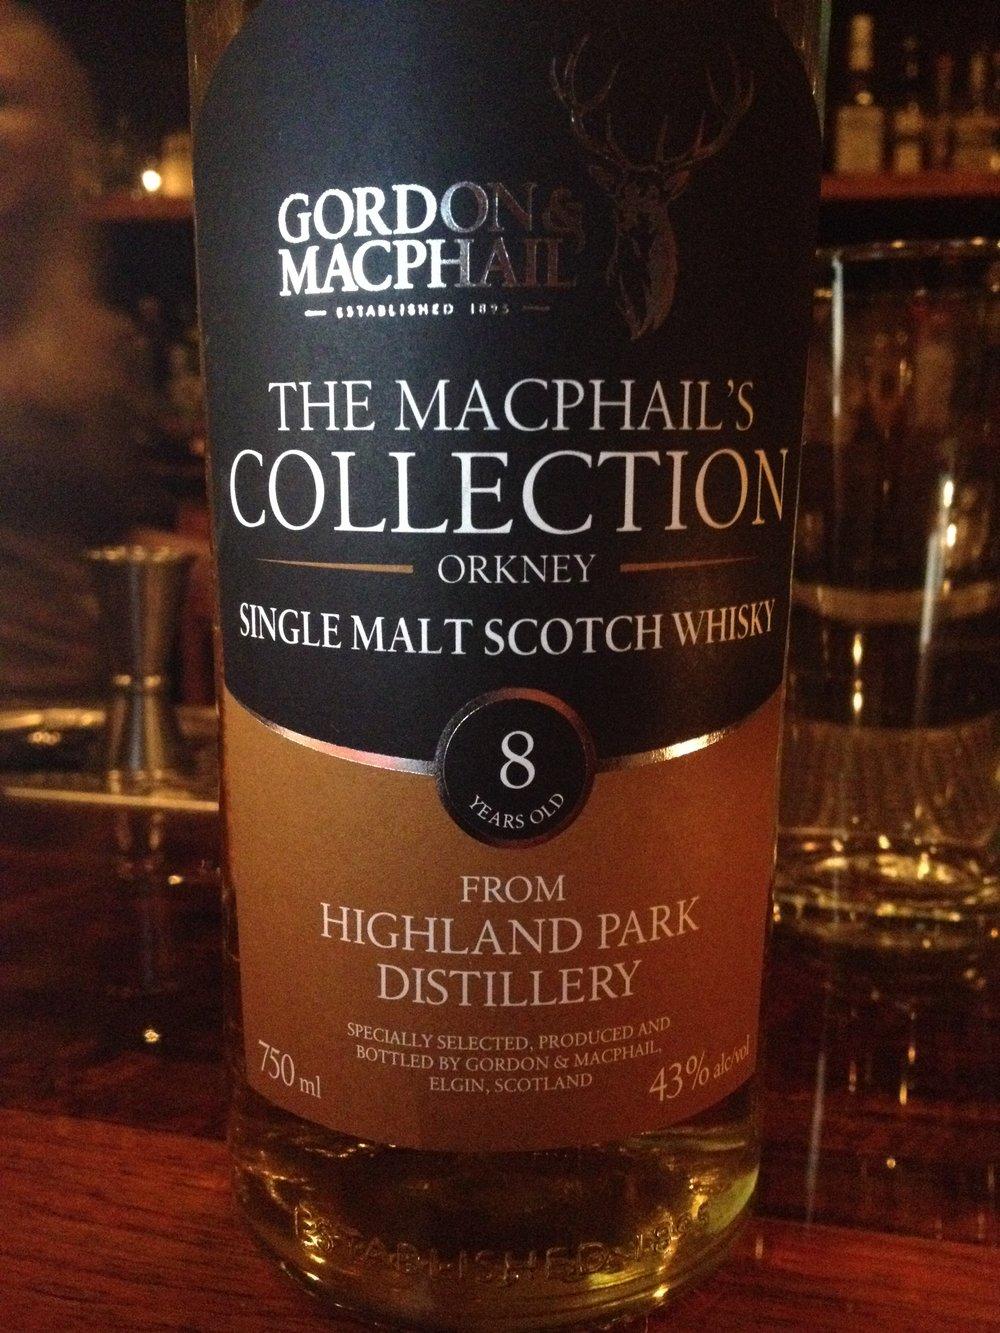 8 Year Old | 43% ABV - Distillery | Highland Park